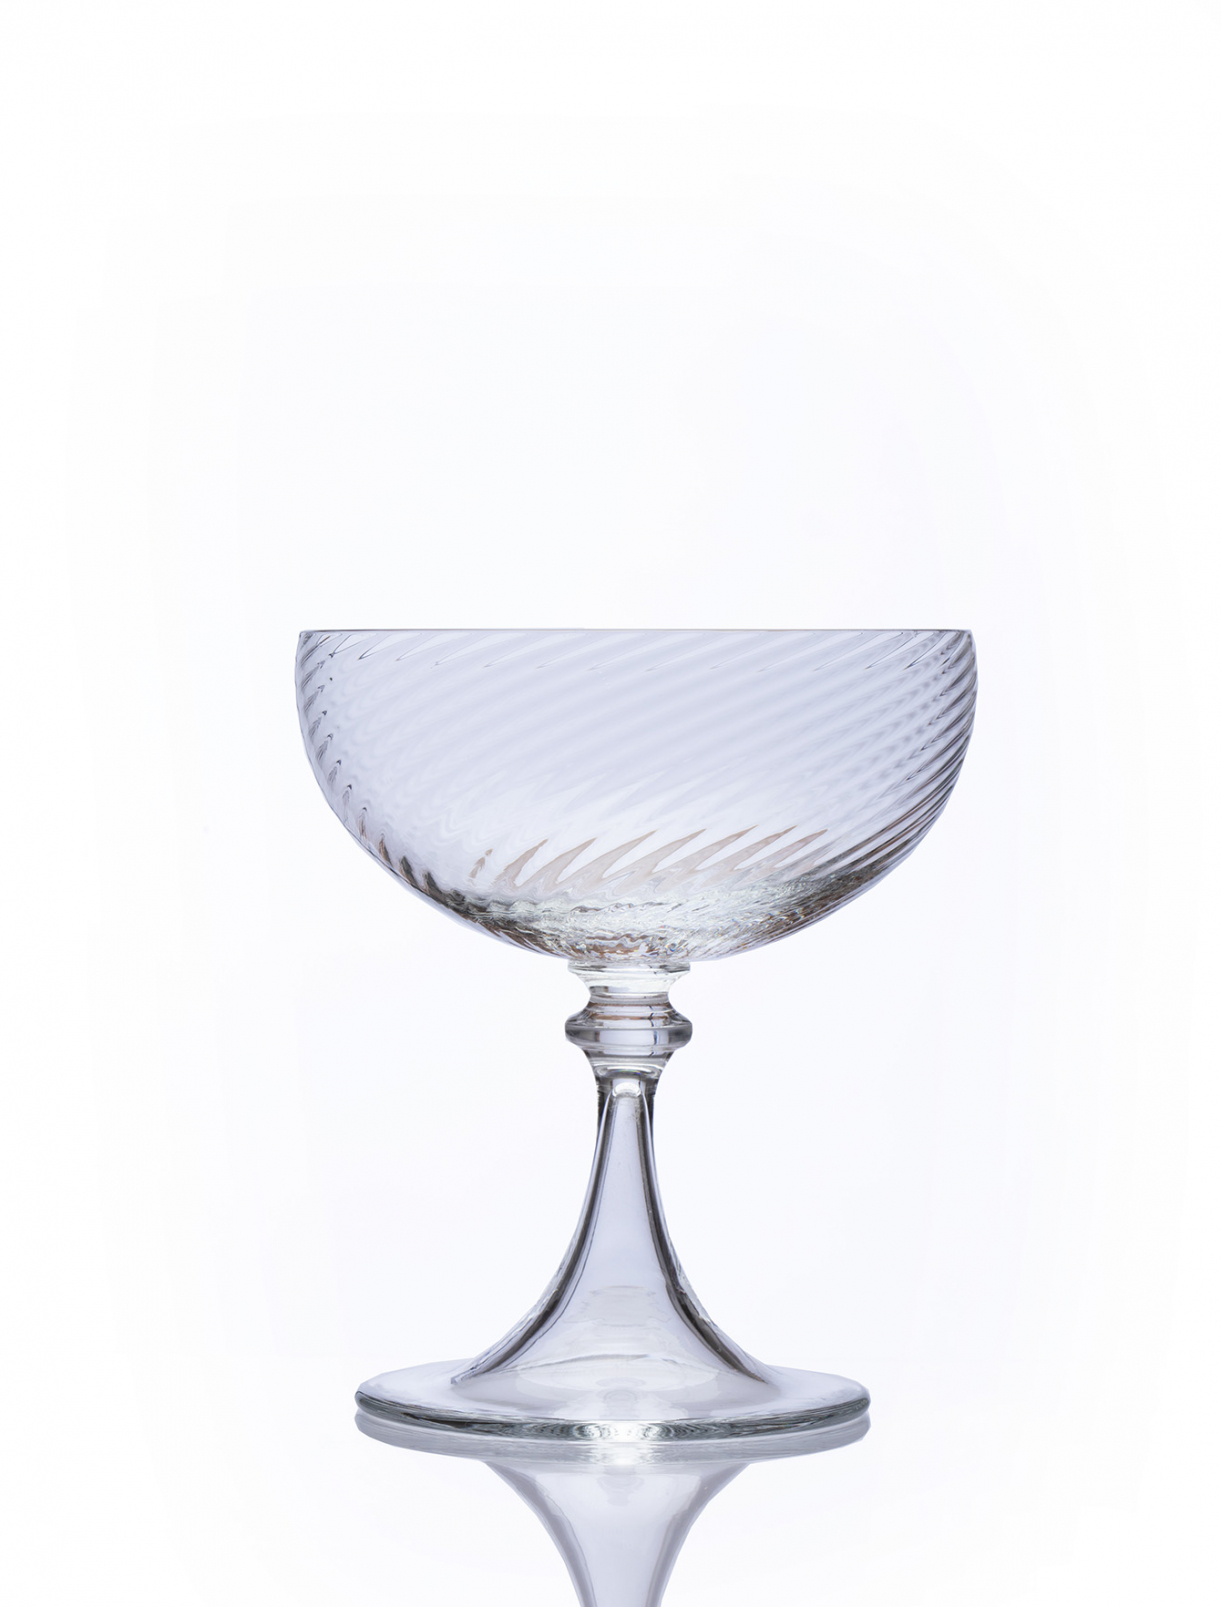 Чаша для шампанского, высота - 12,5, диаметр - 10,2 см NasonMoretti  –  Общий вид